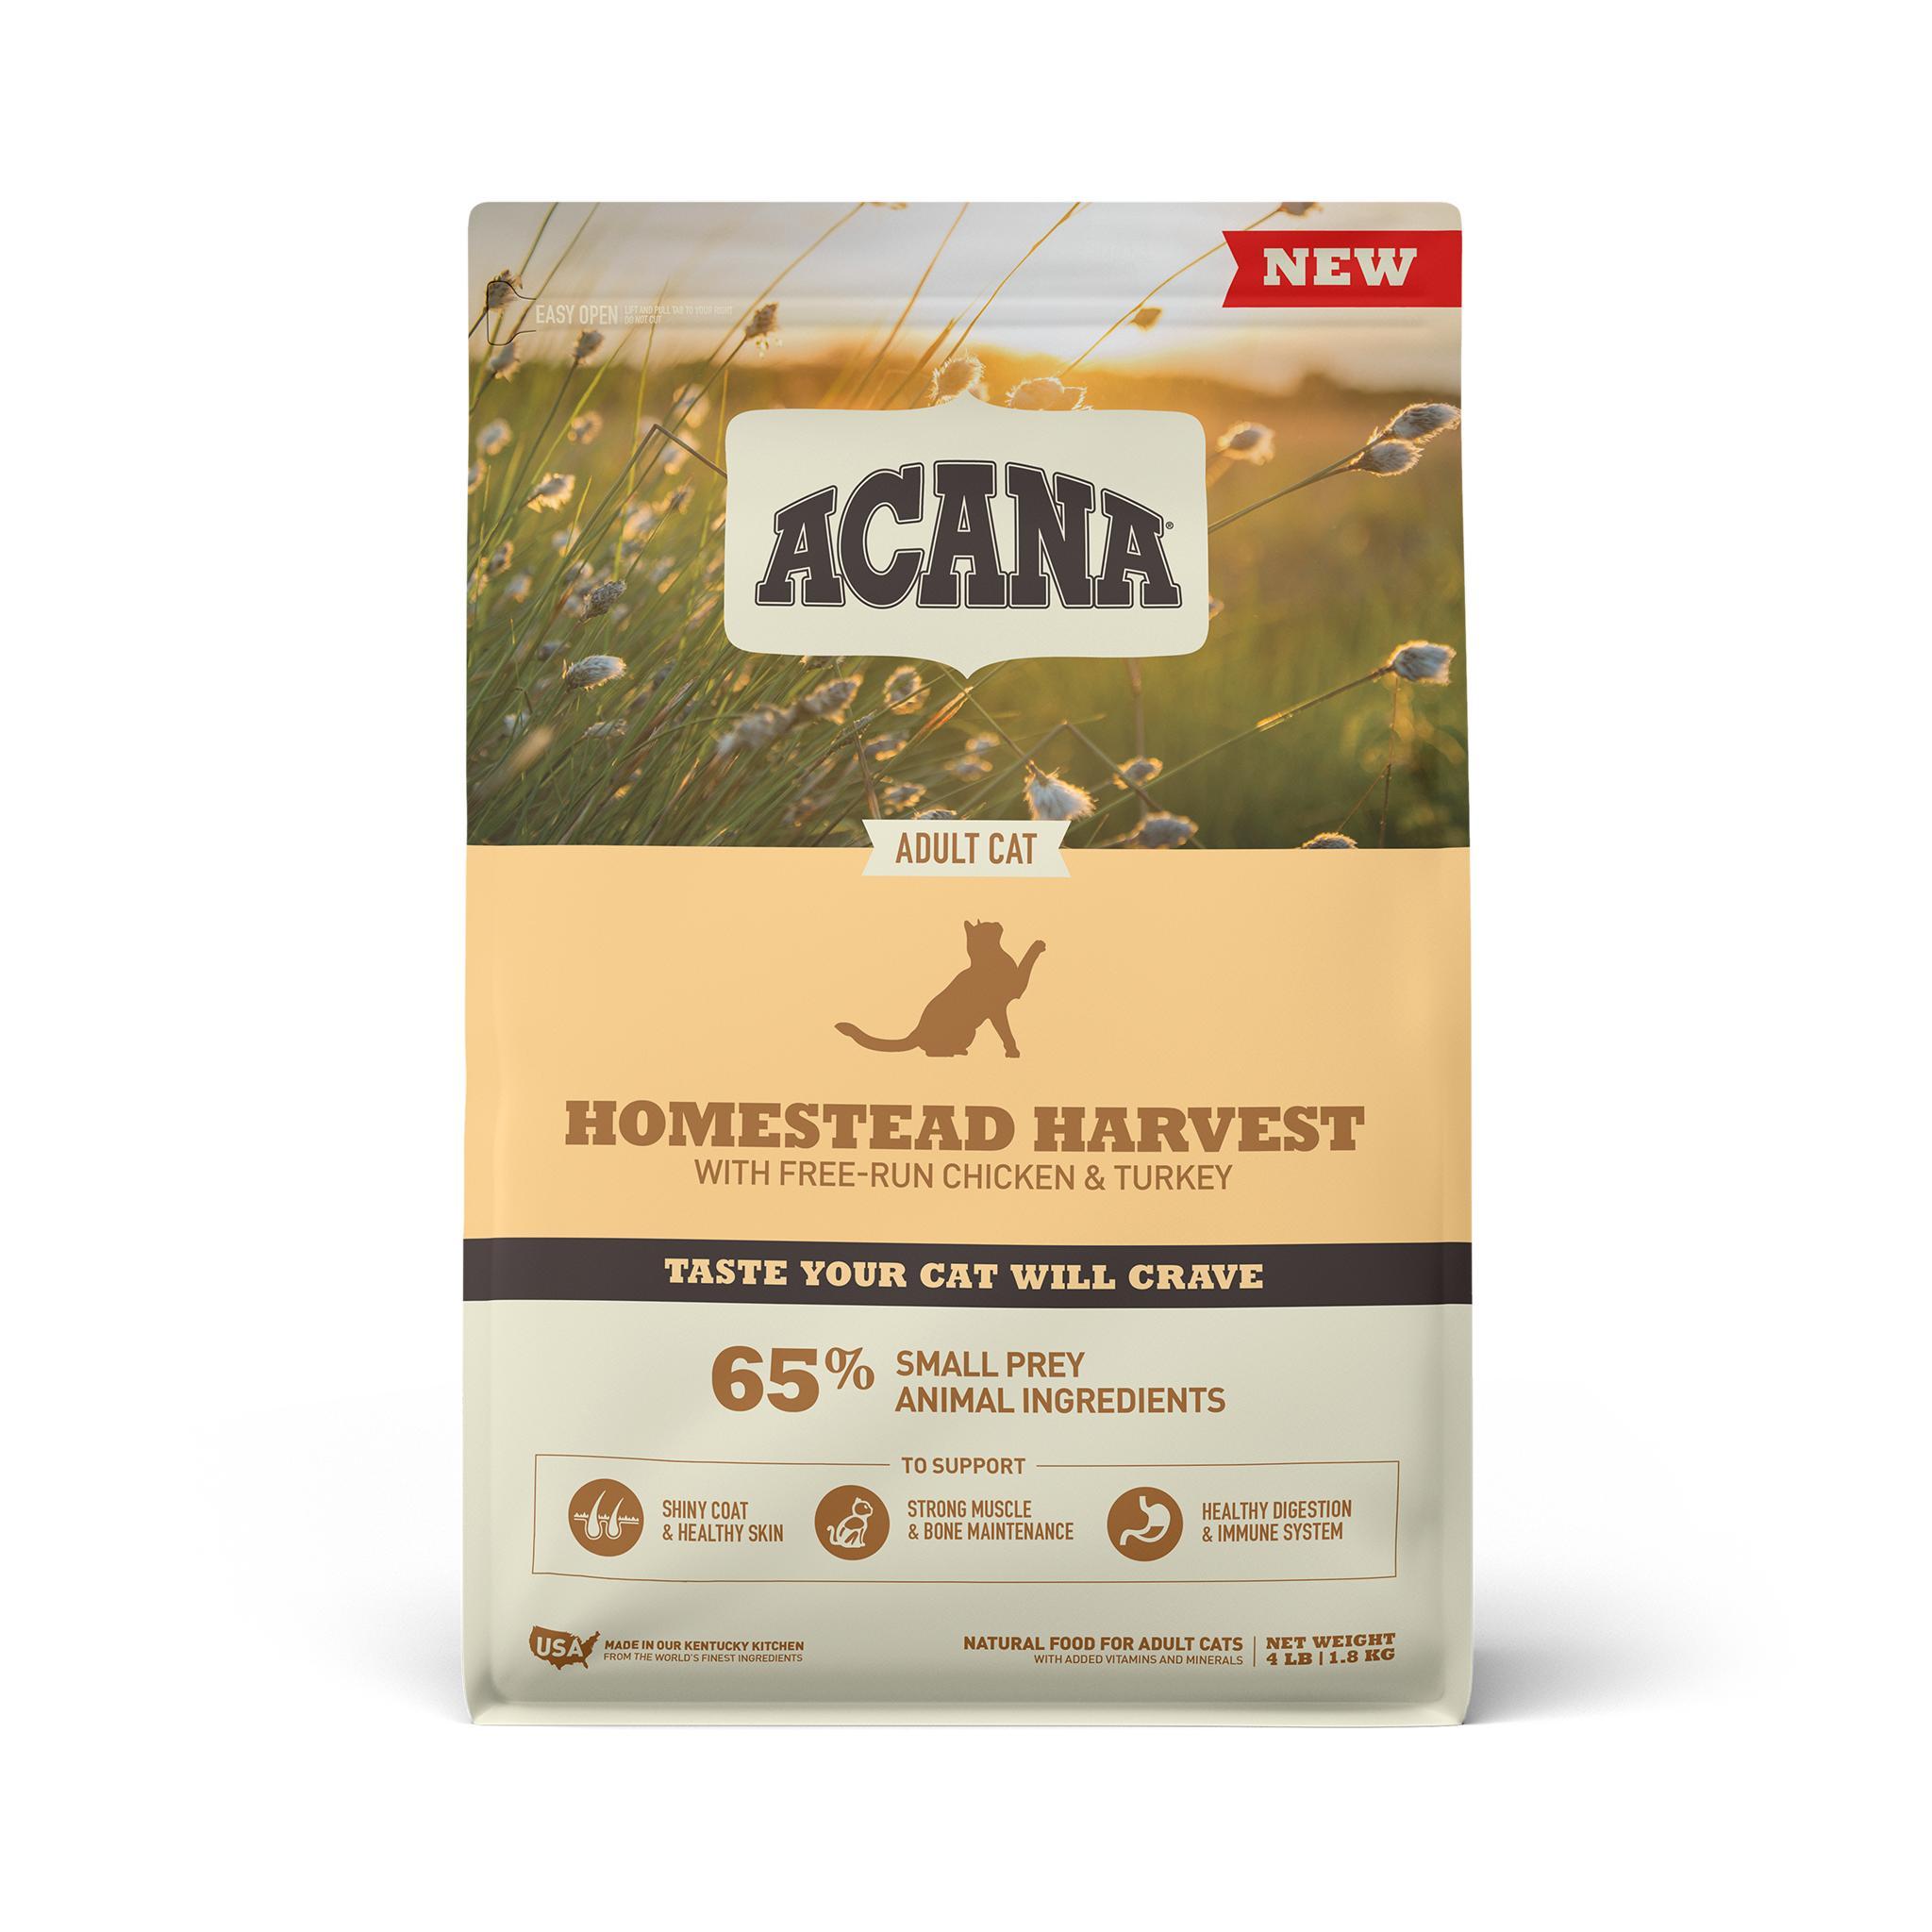 ACANA Homestead Harvest Dry Cat Food, 4-lb